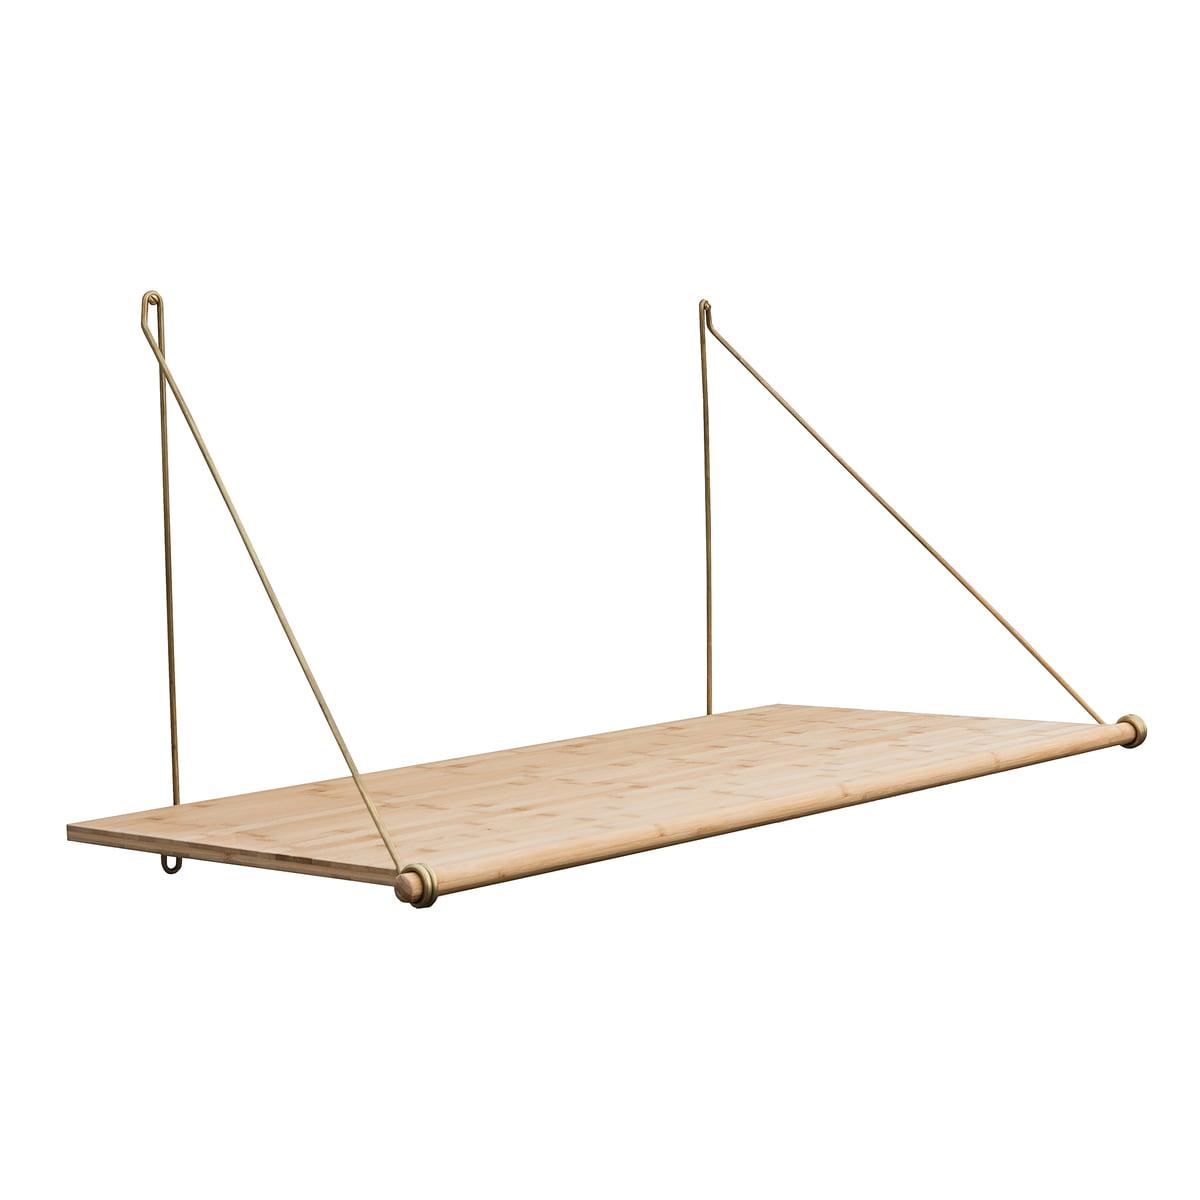 We do wood - Bureau en boucle, bambou / laiton